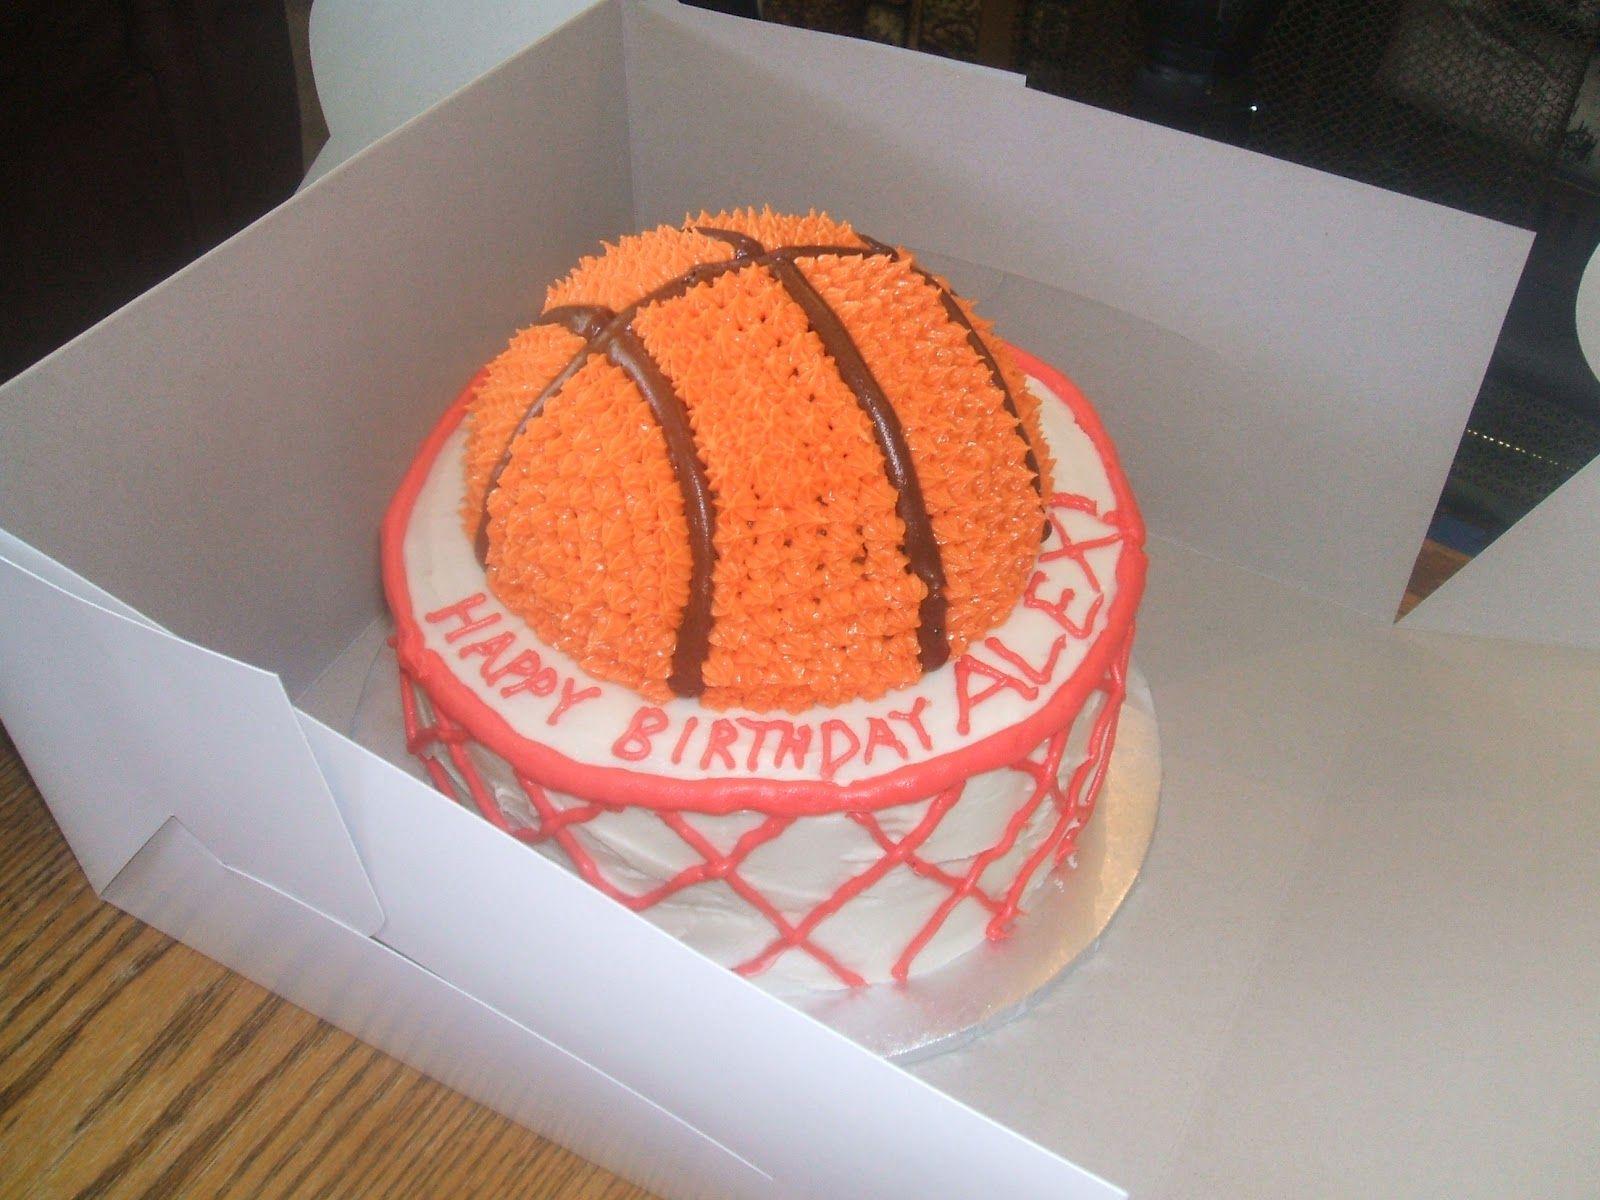 Basketball And Baseball Cakes Basketball Cake Baseball Cake Cake Pop Decorating